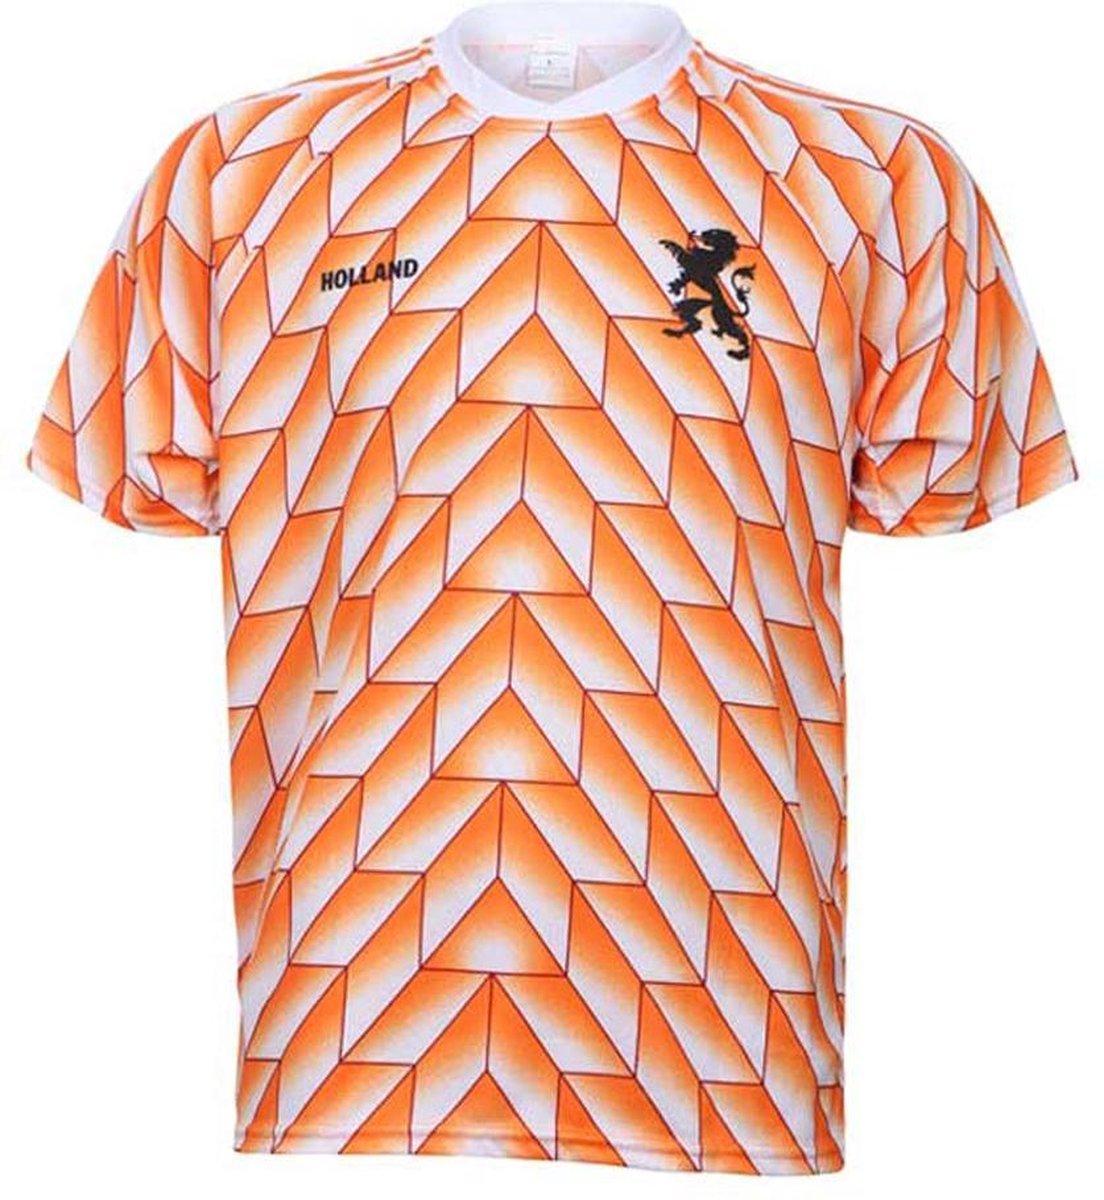 EK 88 Voetbalshirt 1988 Blanco-M